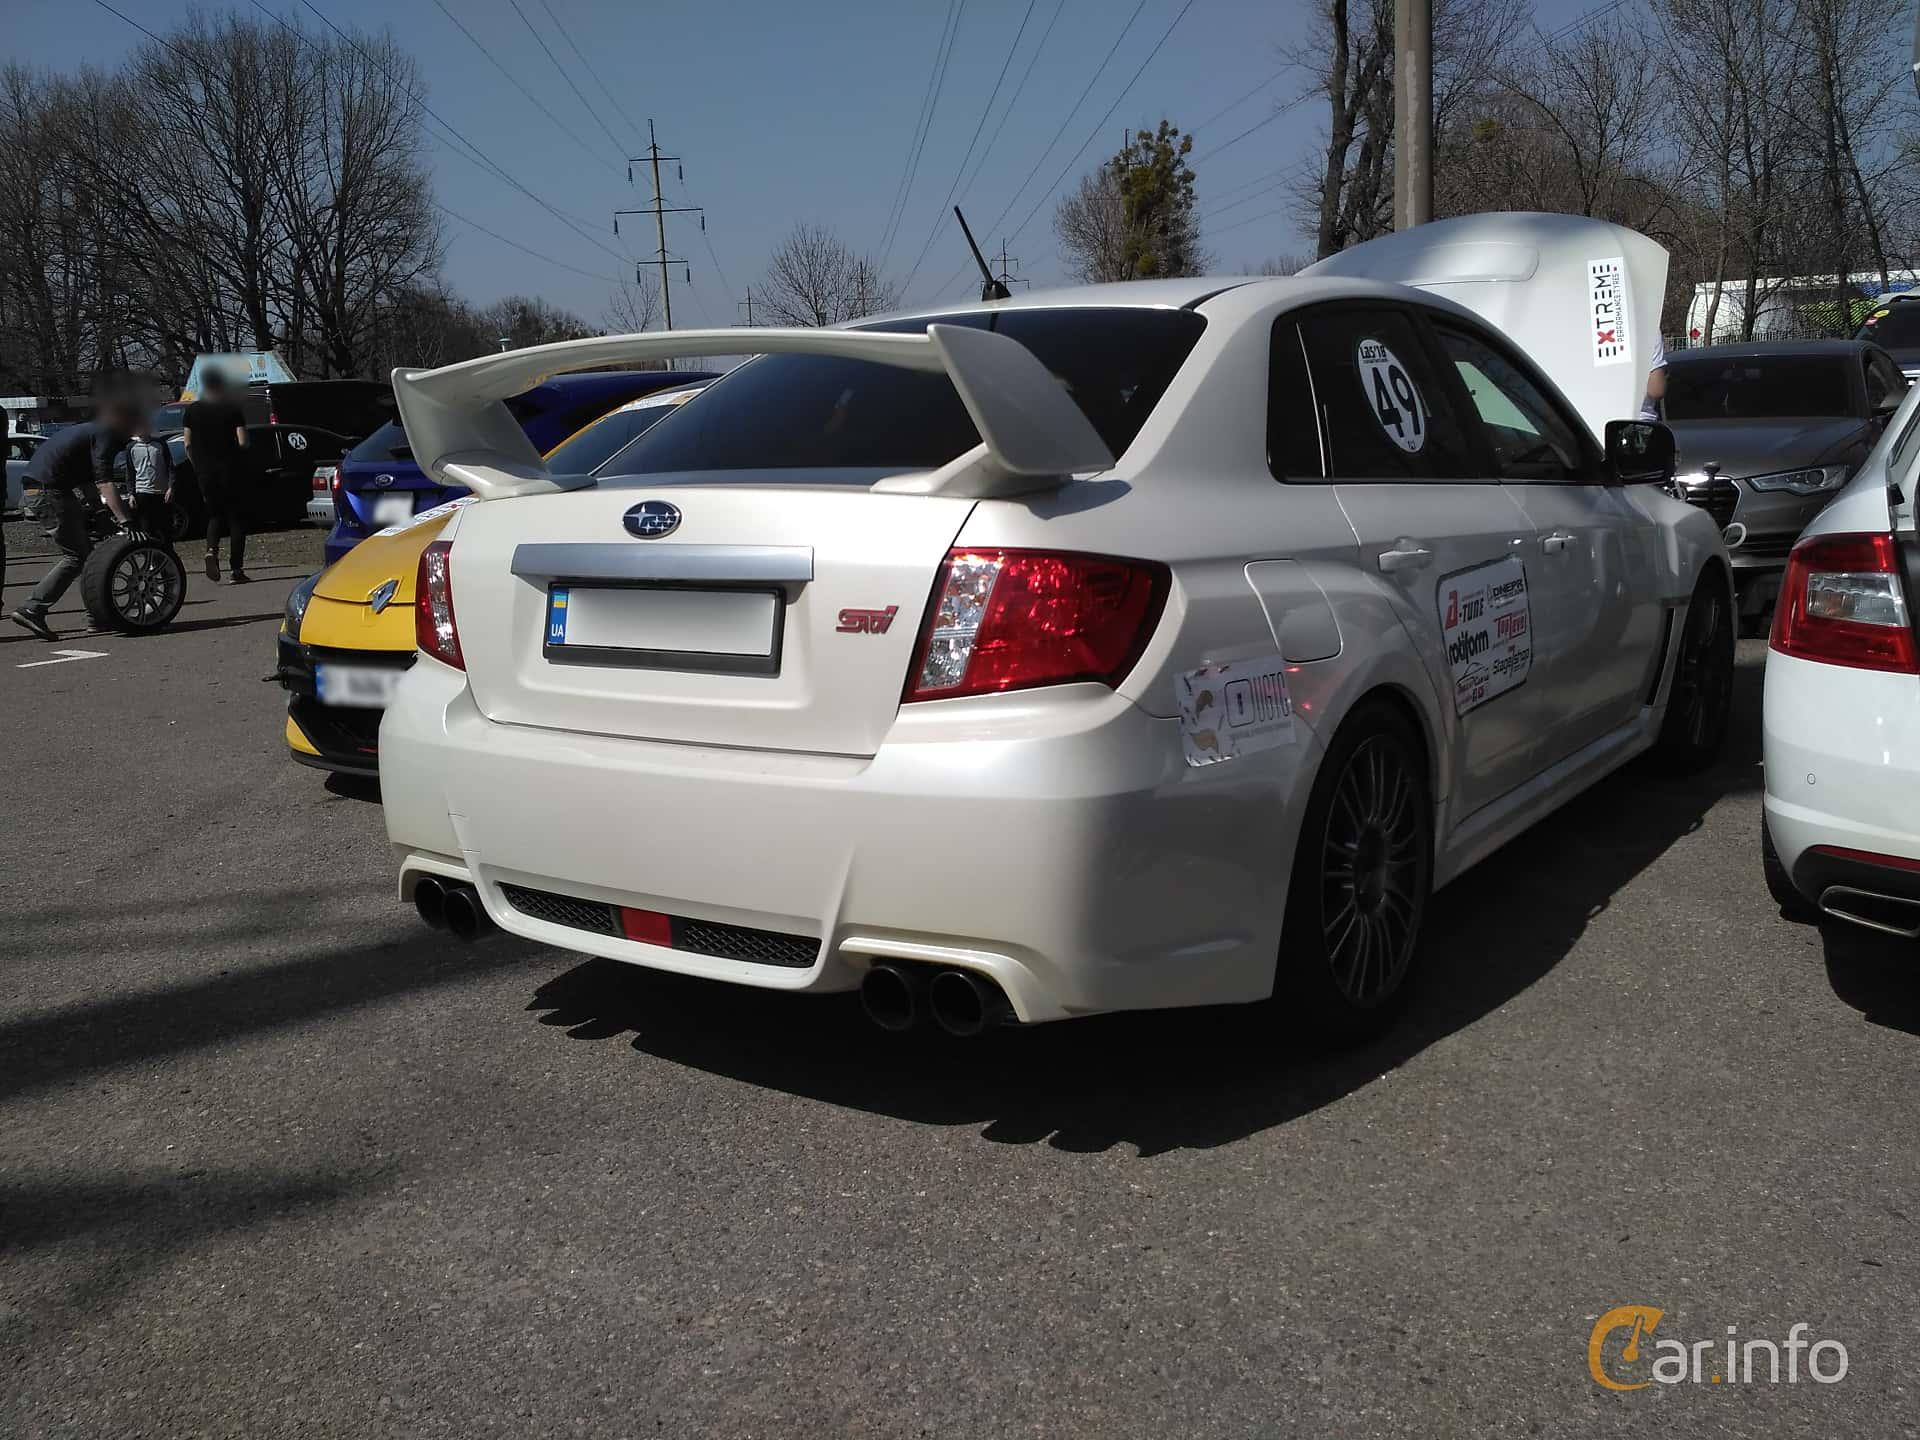 Subaru WRX STi Sedan 2.5 4WD Manuell, 300hk, 2007 at Ltava Time Attack 1st Stage